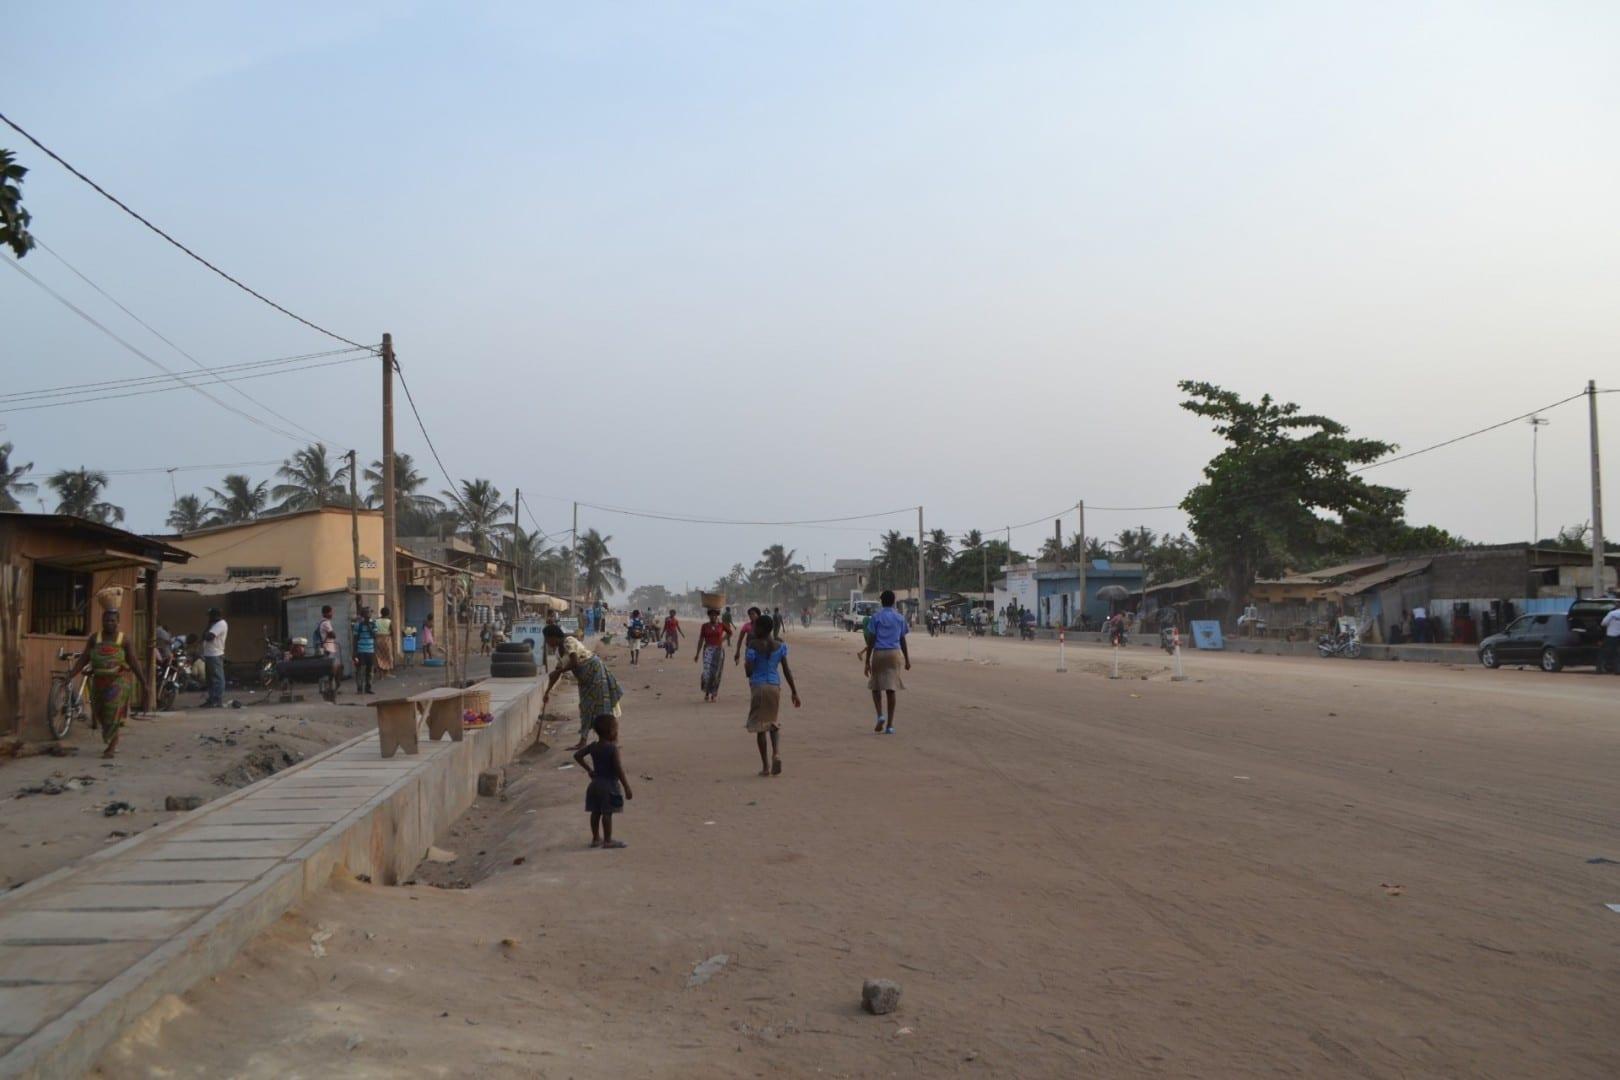 Tarde cerca del puerto de Lomé en 2013 Lomé Togo